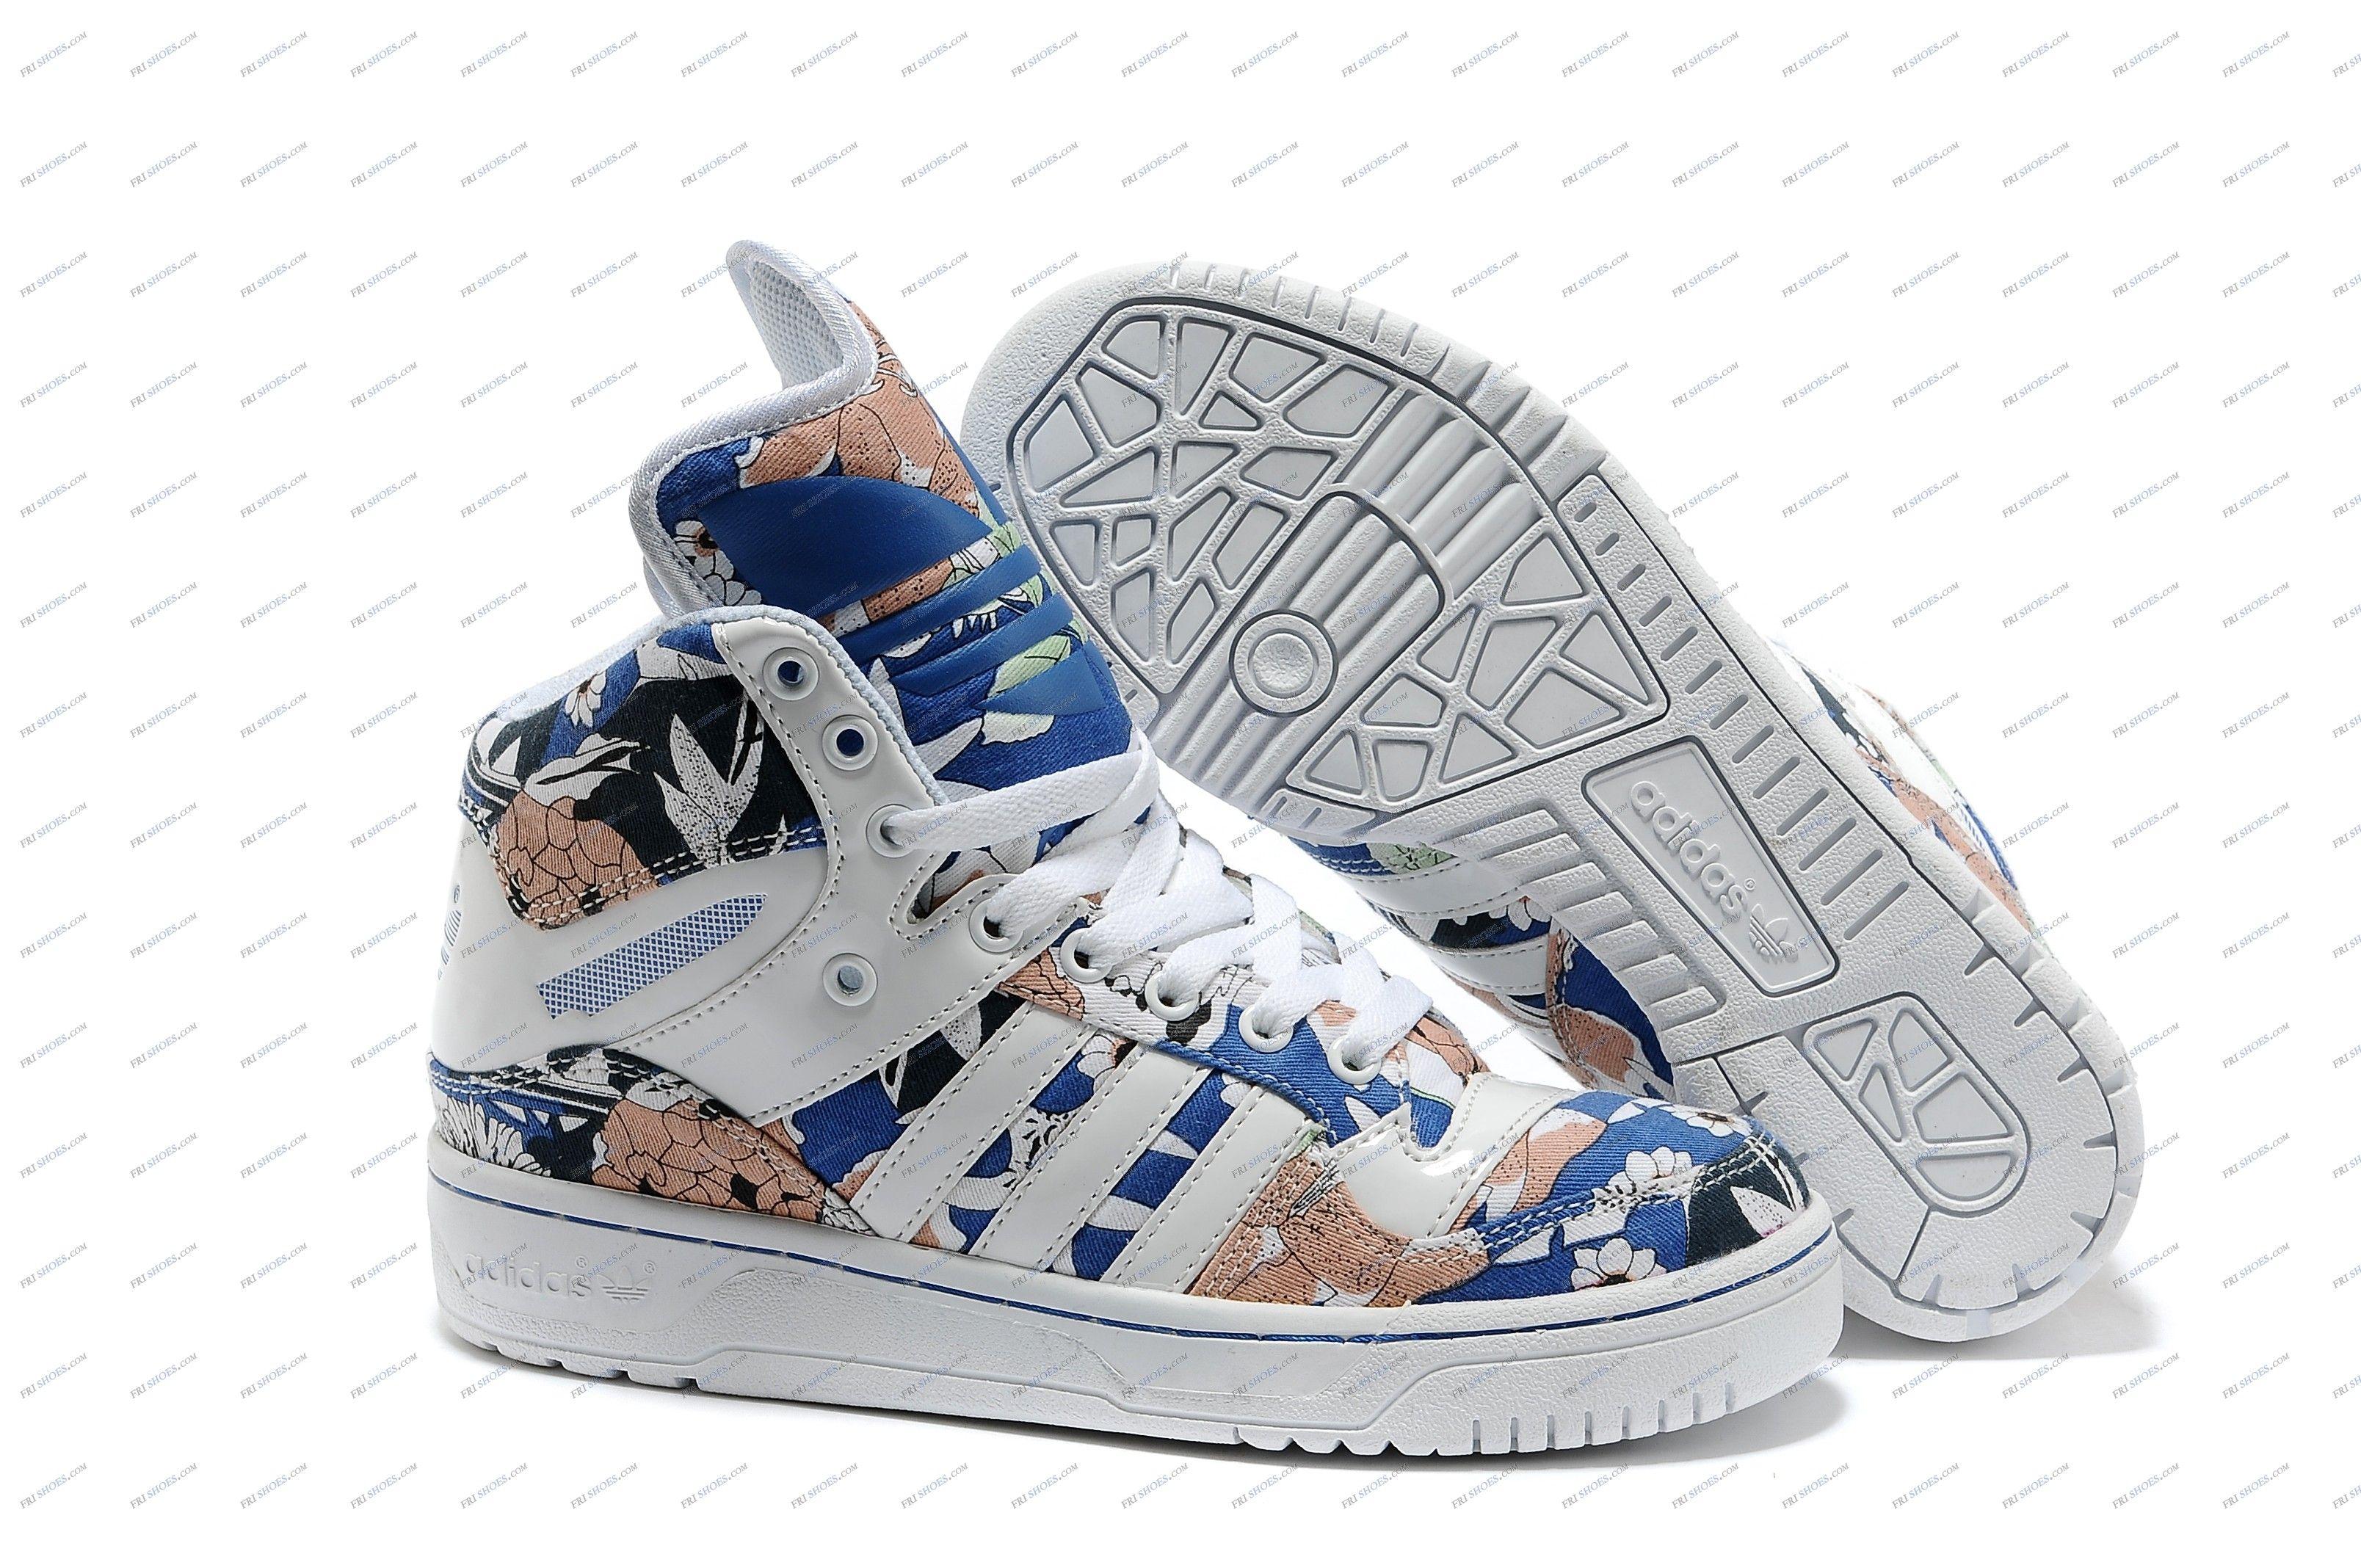 Adidas Honey Mid Blue Flower Women S Running Shoes Adidas Originals Shop Adidas Running Shoes Women Running Shoes On Sale Adidas Honey